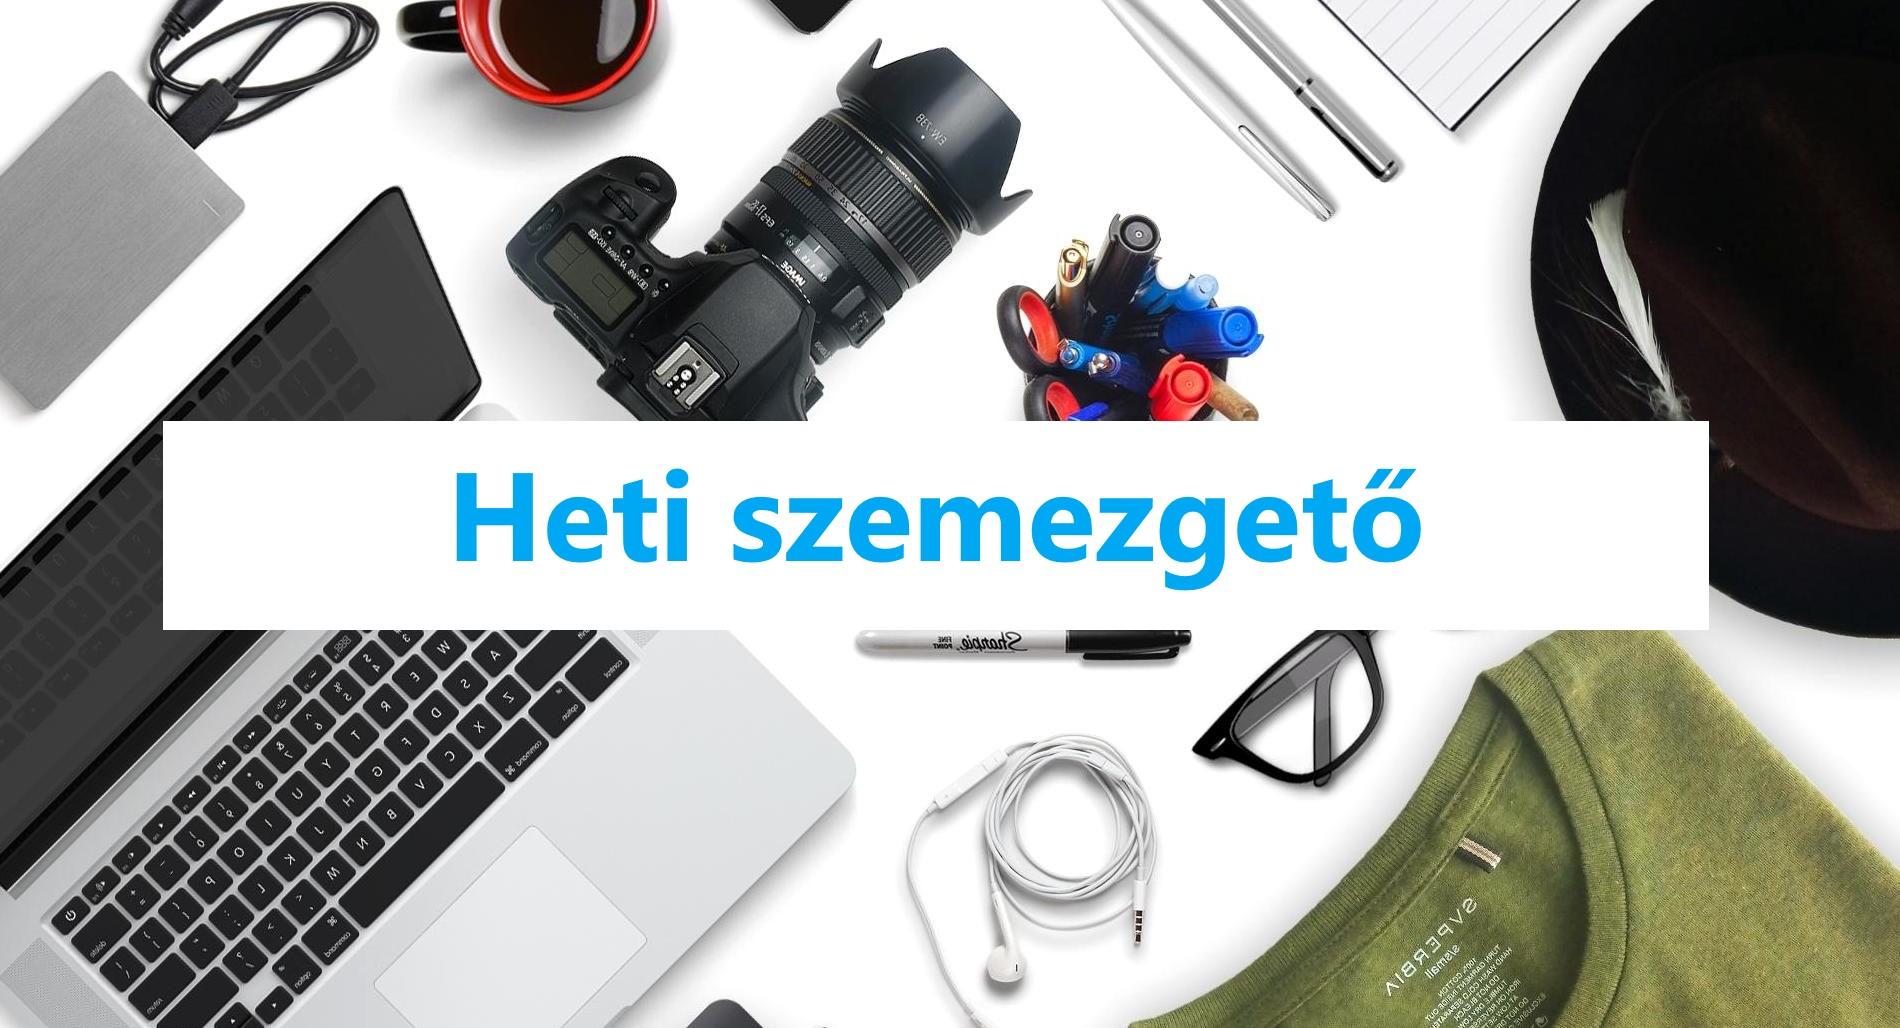 heti_szemezgeto_uj_49.jpg